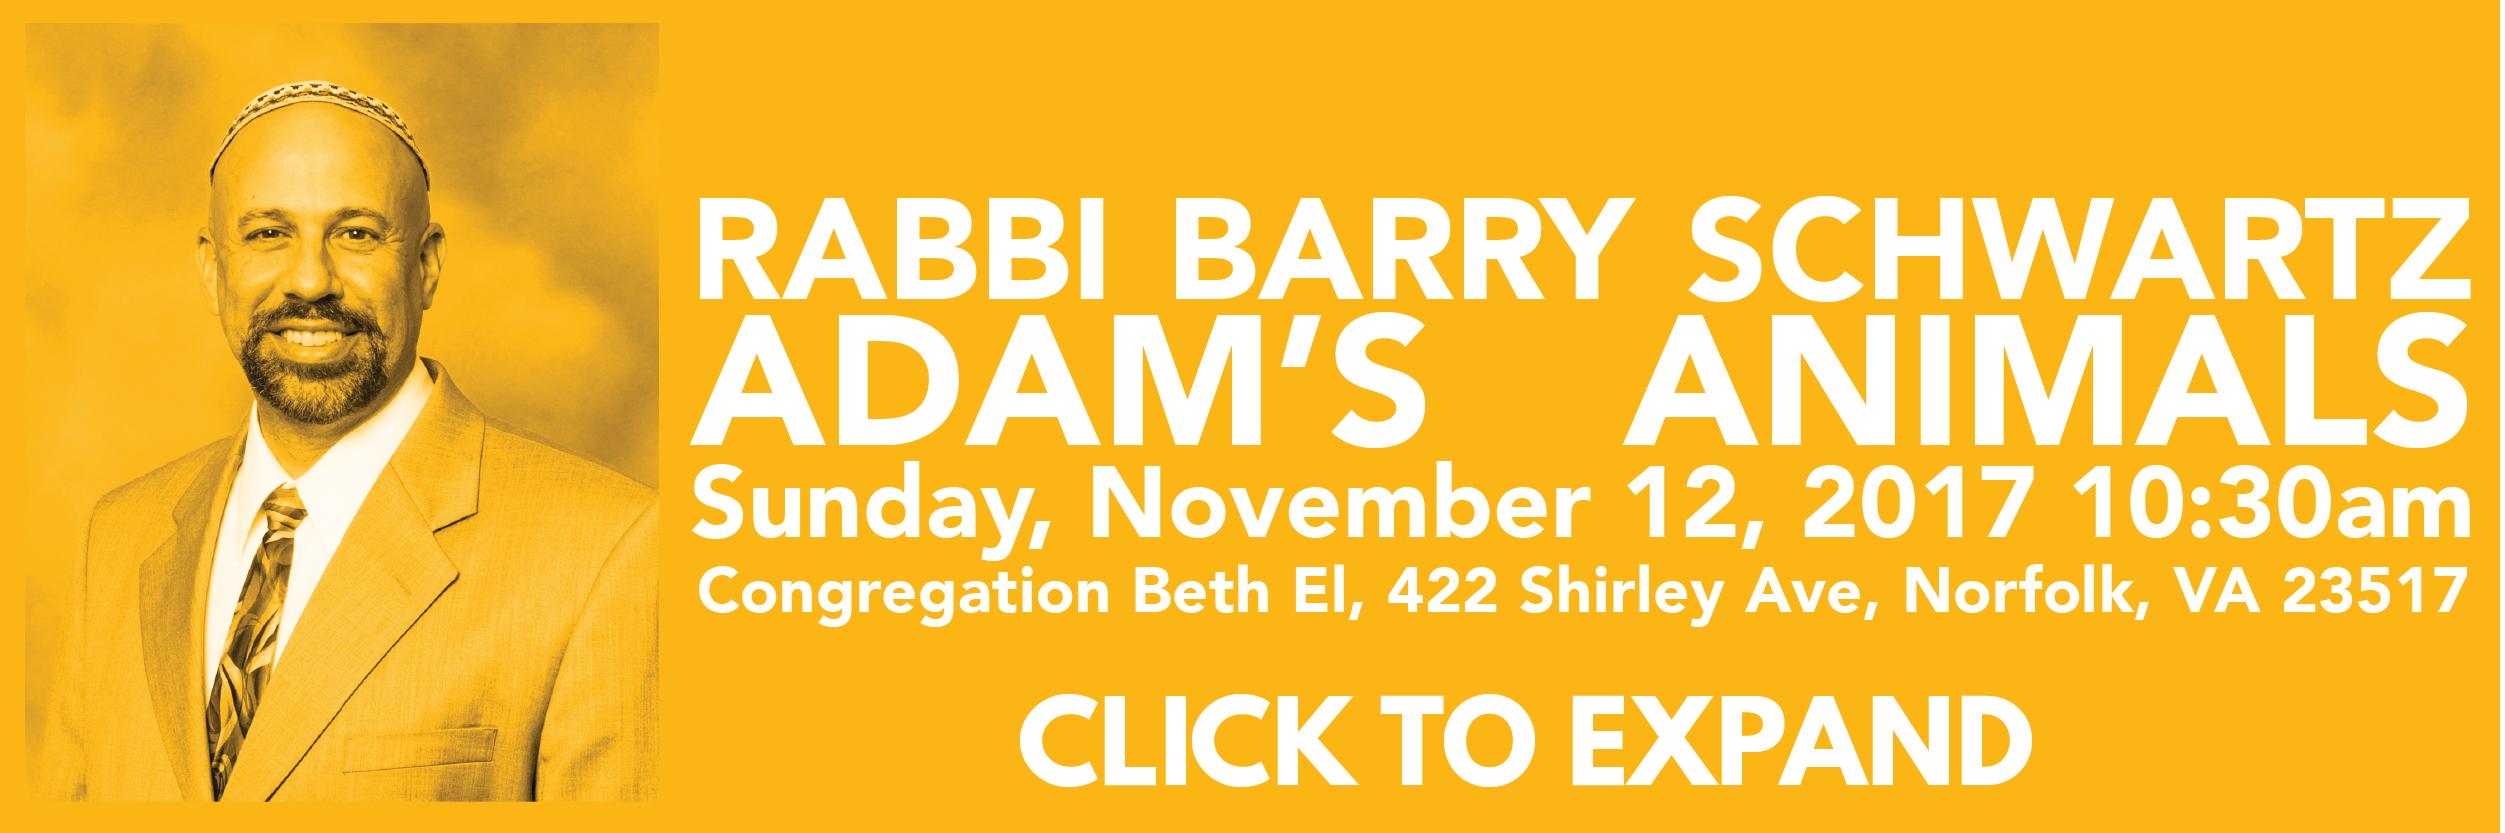 Rabbi Barry Schwartz